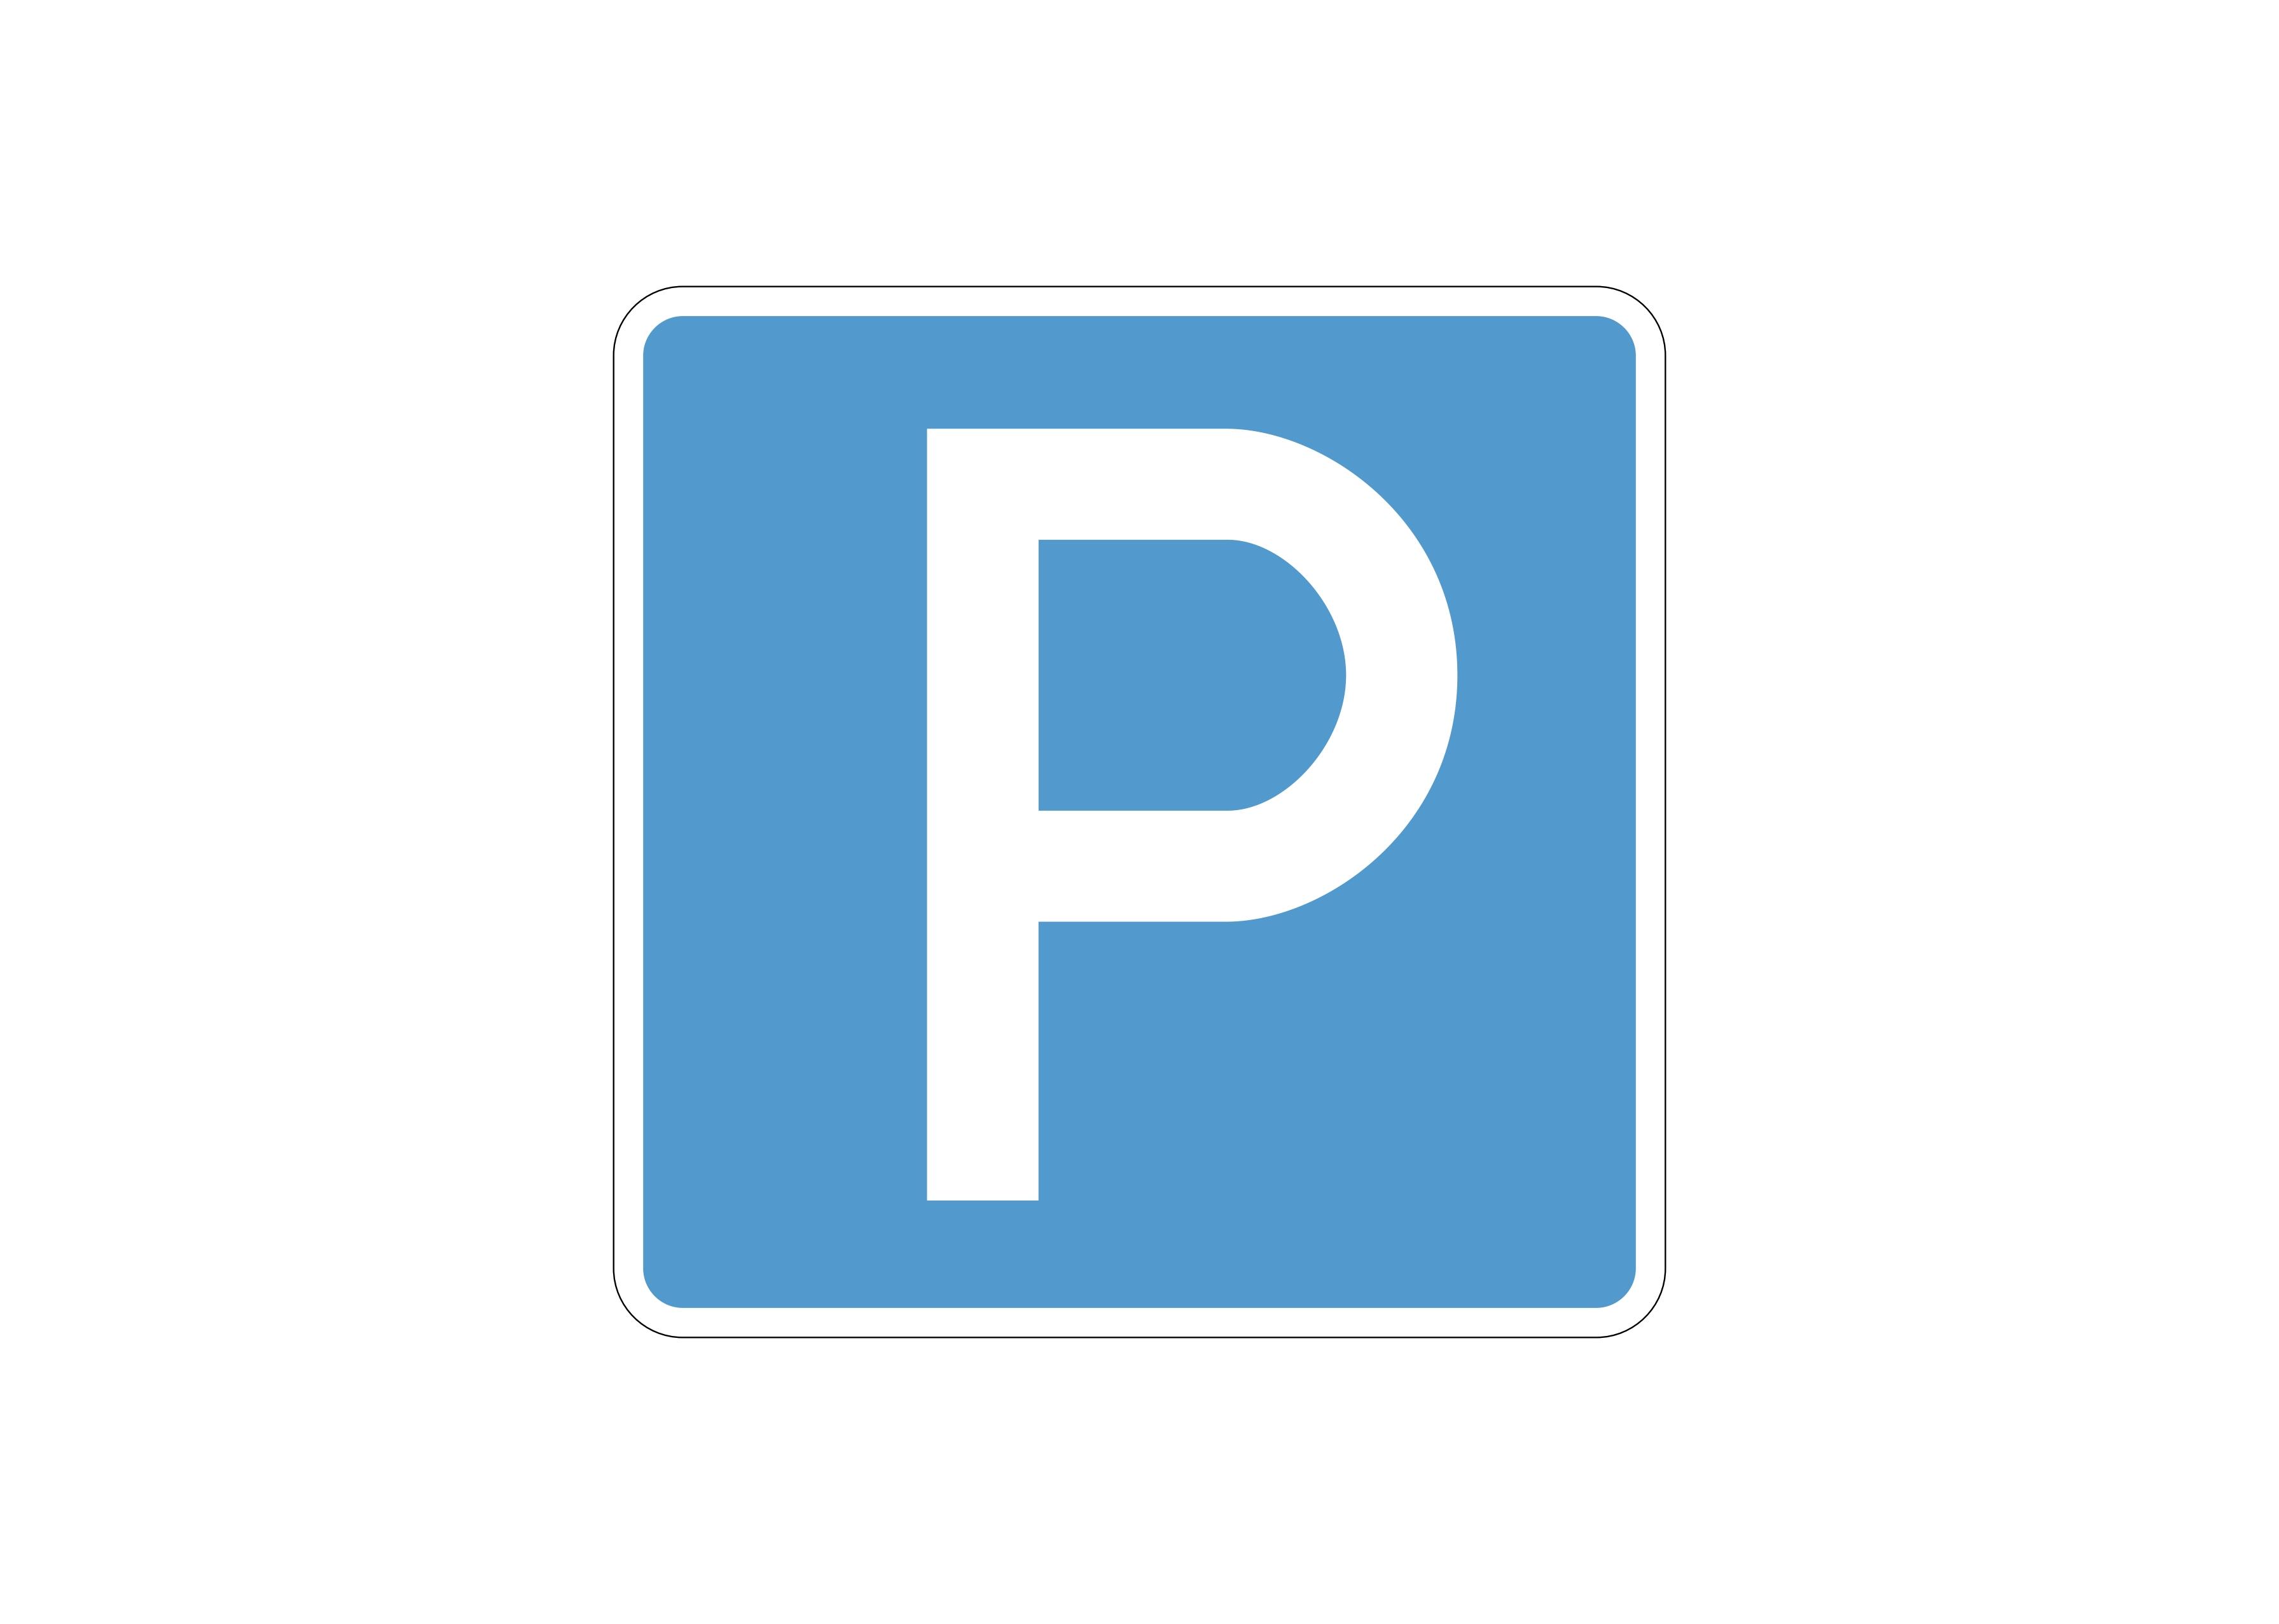 картинки знак автостоянка